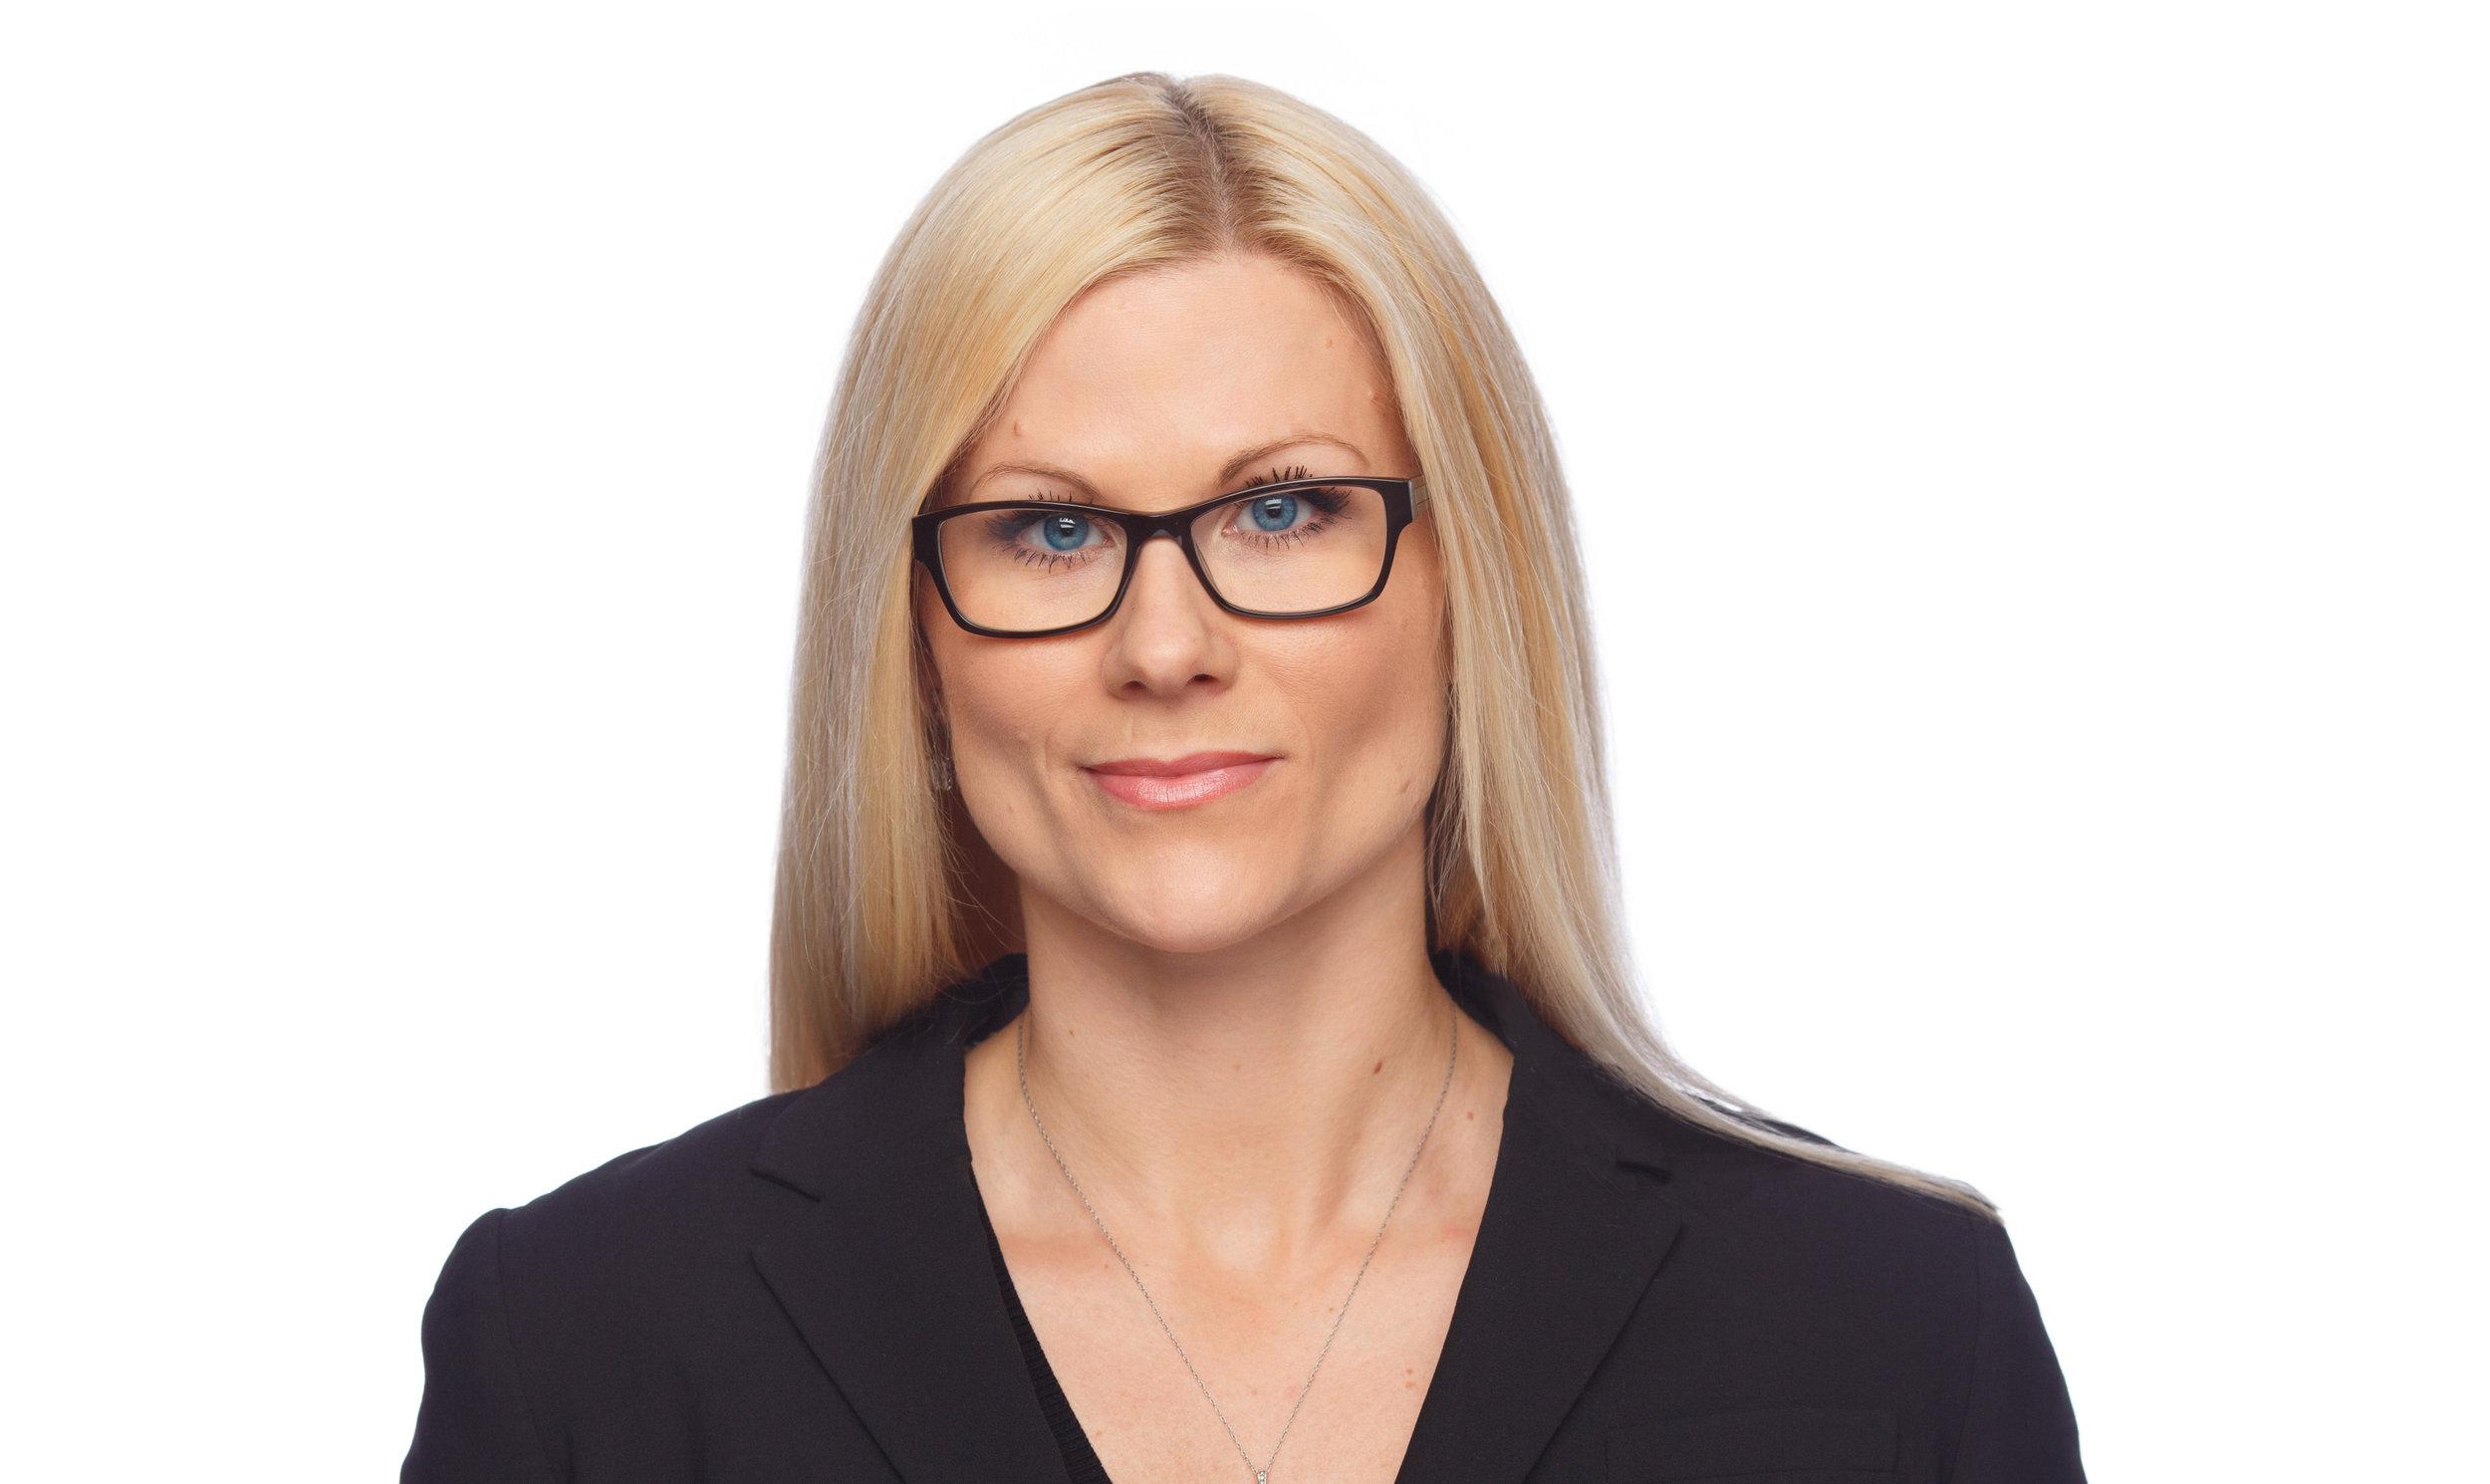 Joanna Robinson joins Burwood Group's leadership team as Regional Vice President, Western Region